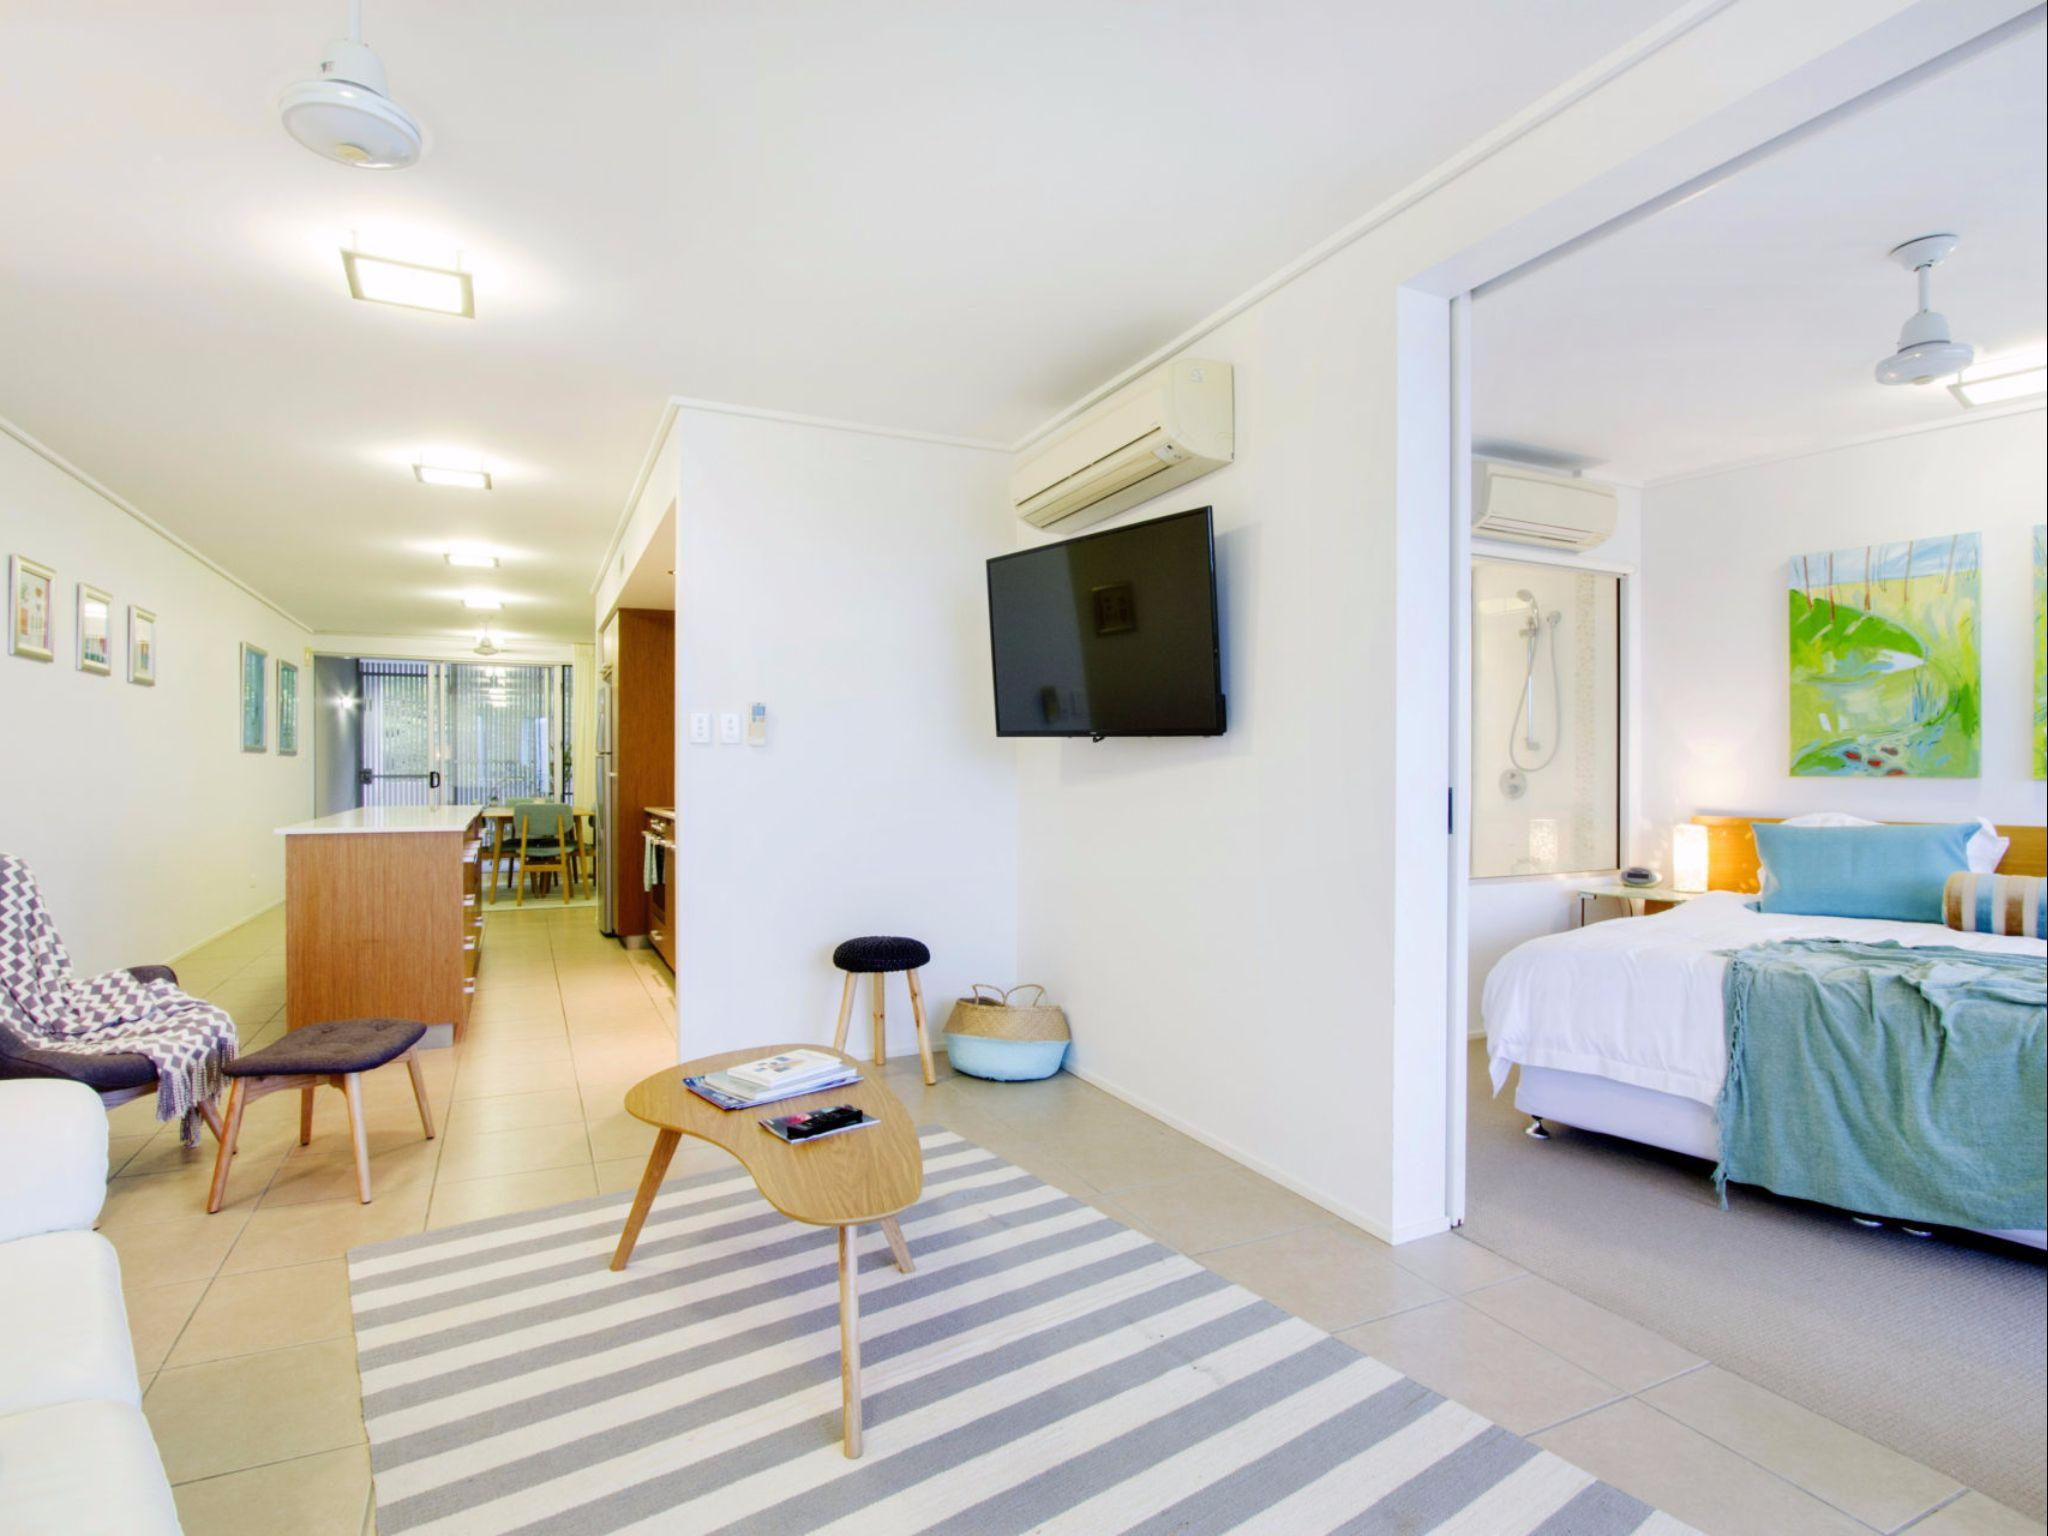 Tranquility Luxury 2 Bedroom Apartment